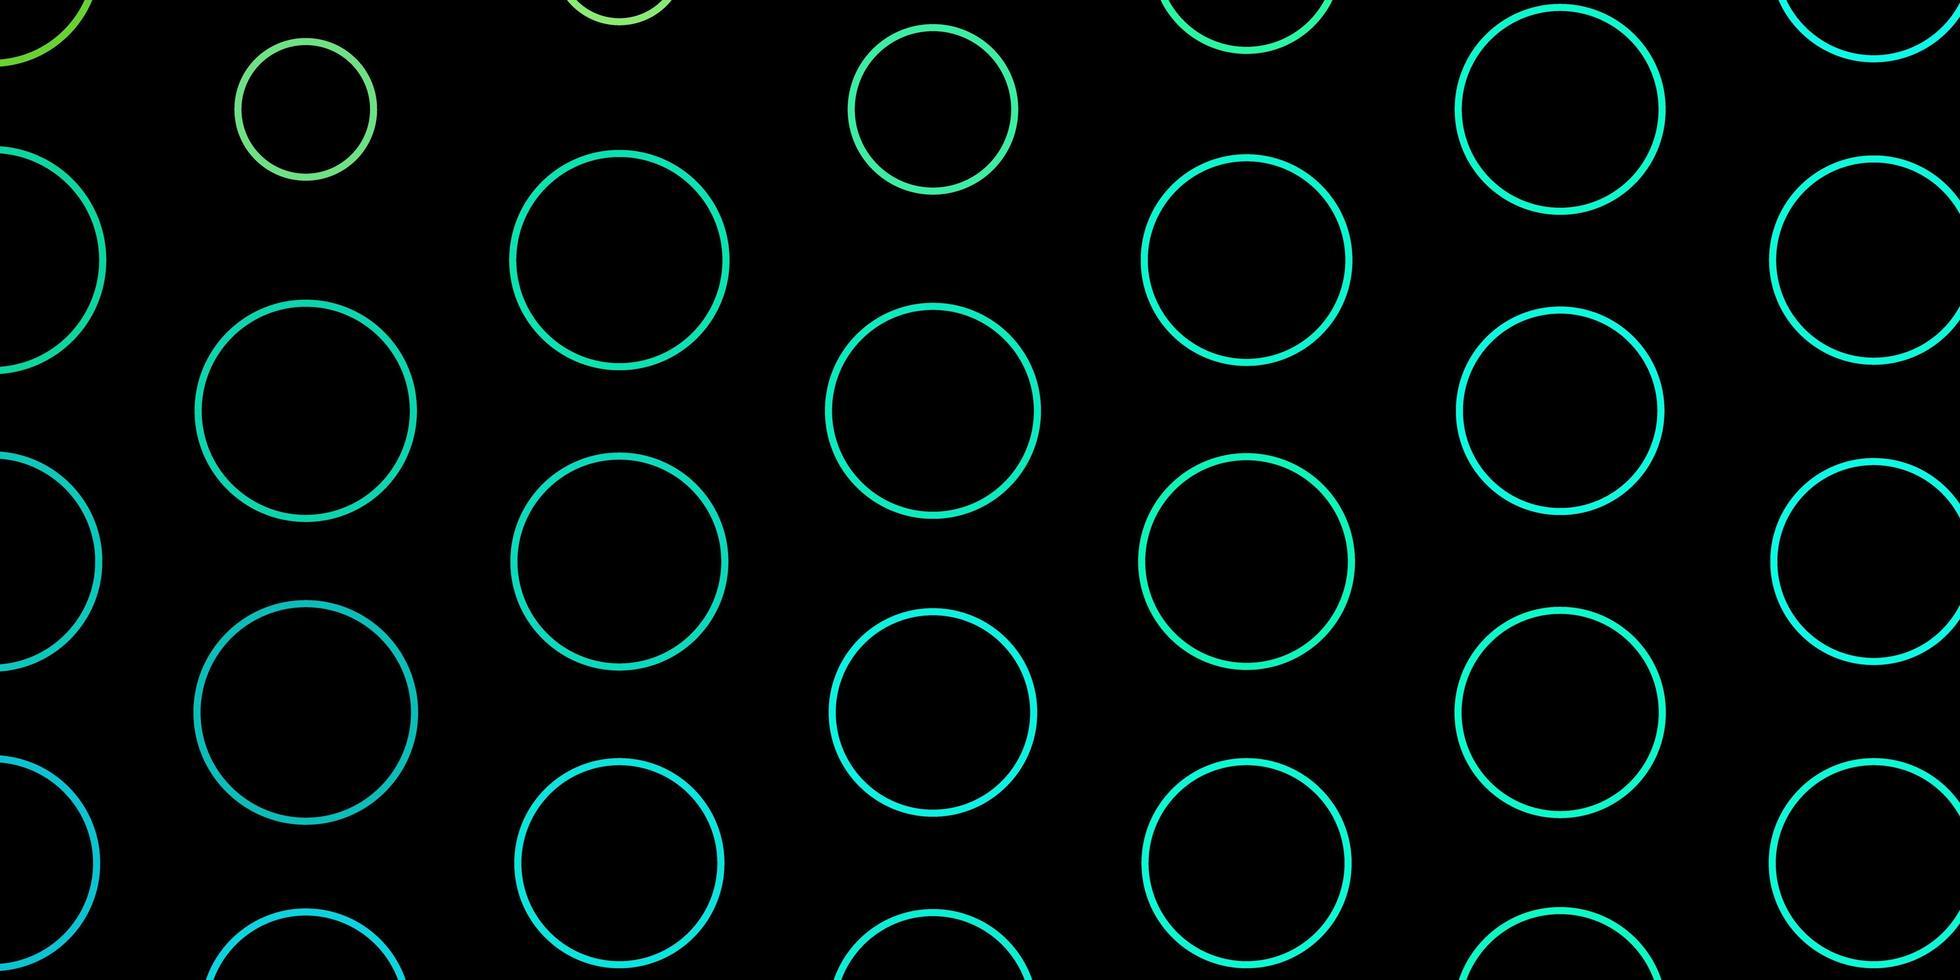 donkergroene lay-out met cirkels. vector